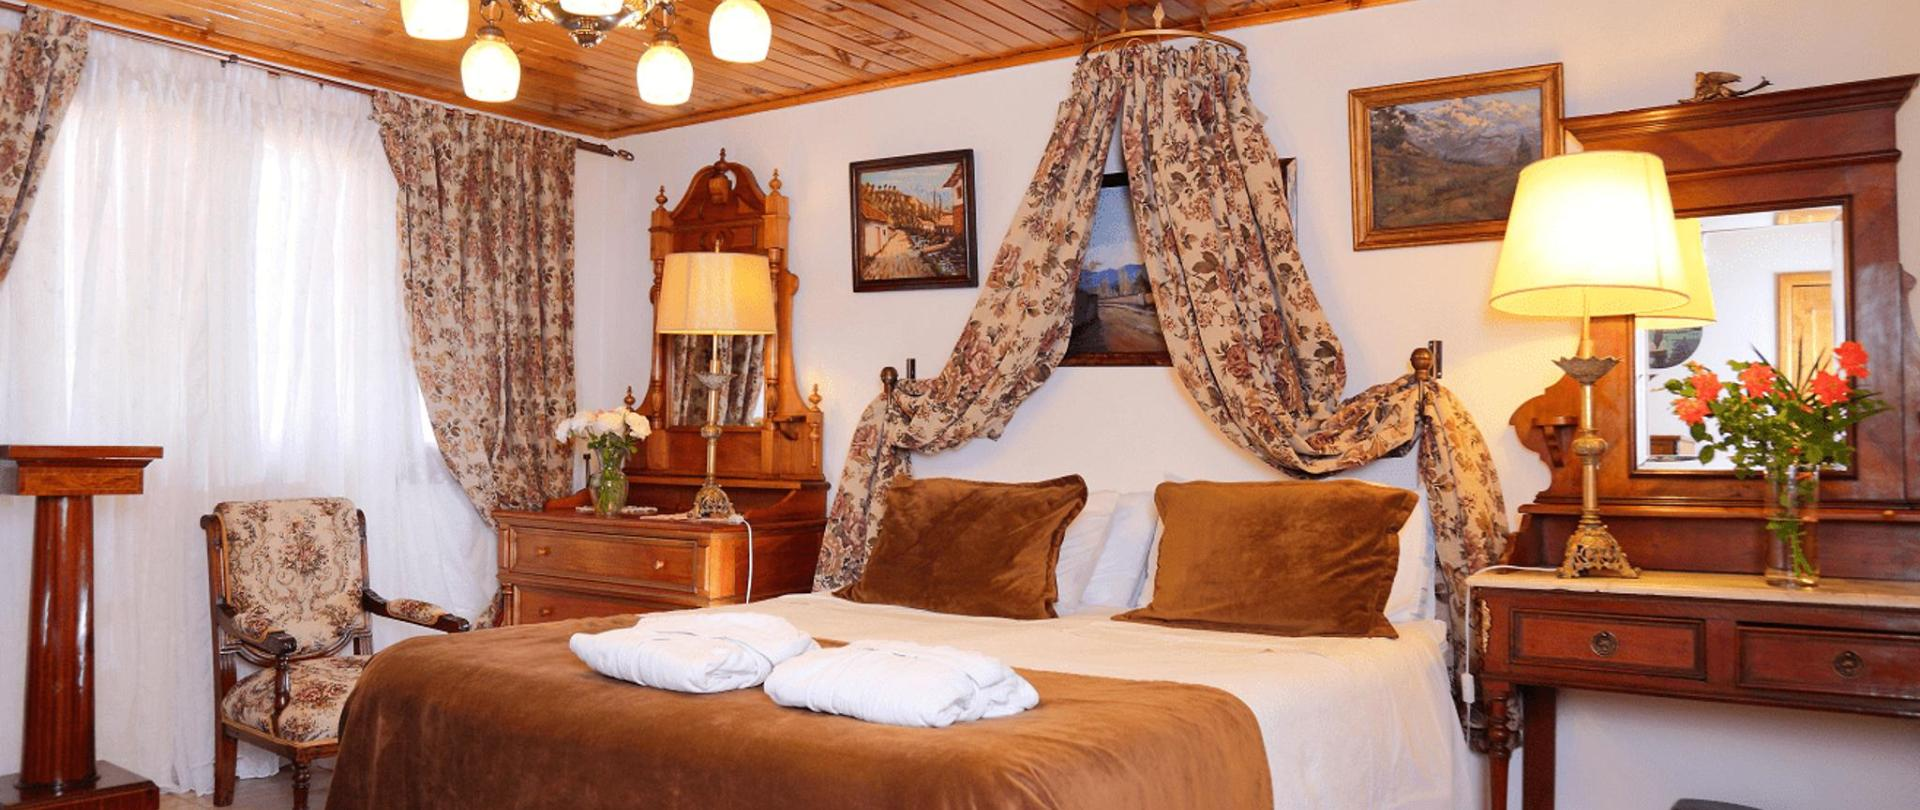 HOTEL BOUTIQUE VINTAGE SANTA CRUZ 03-min.png